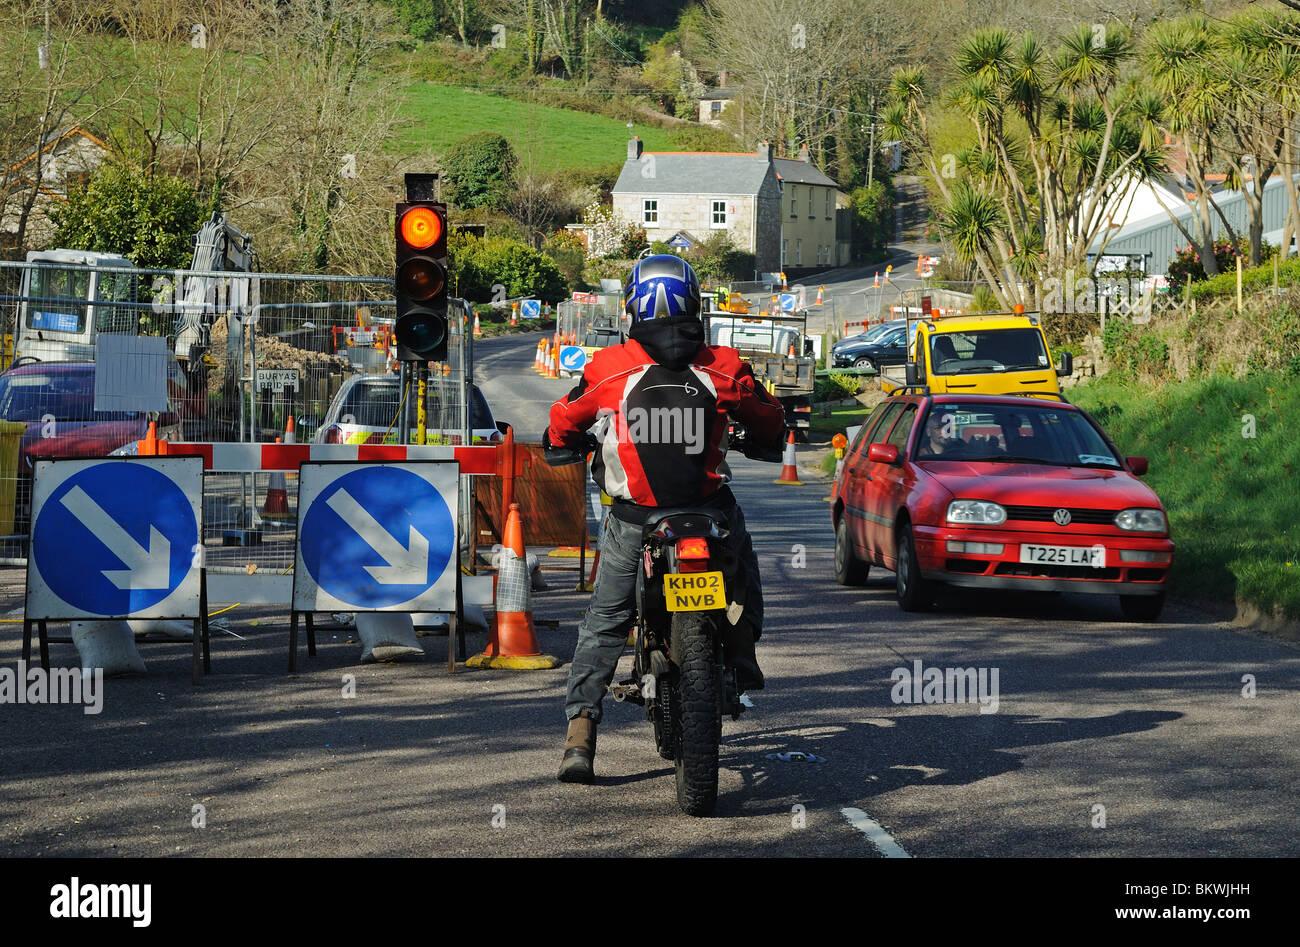 a motorbike waiting at roadworks traffic control lights, cornwall, uk - Stock Image